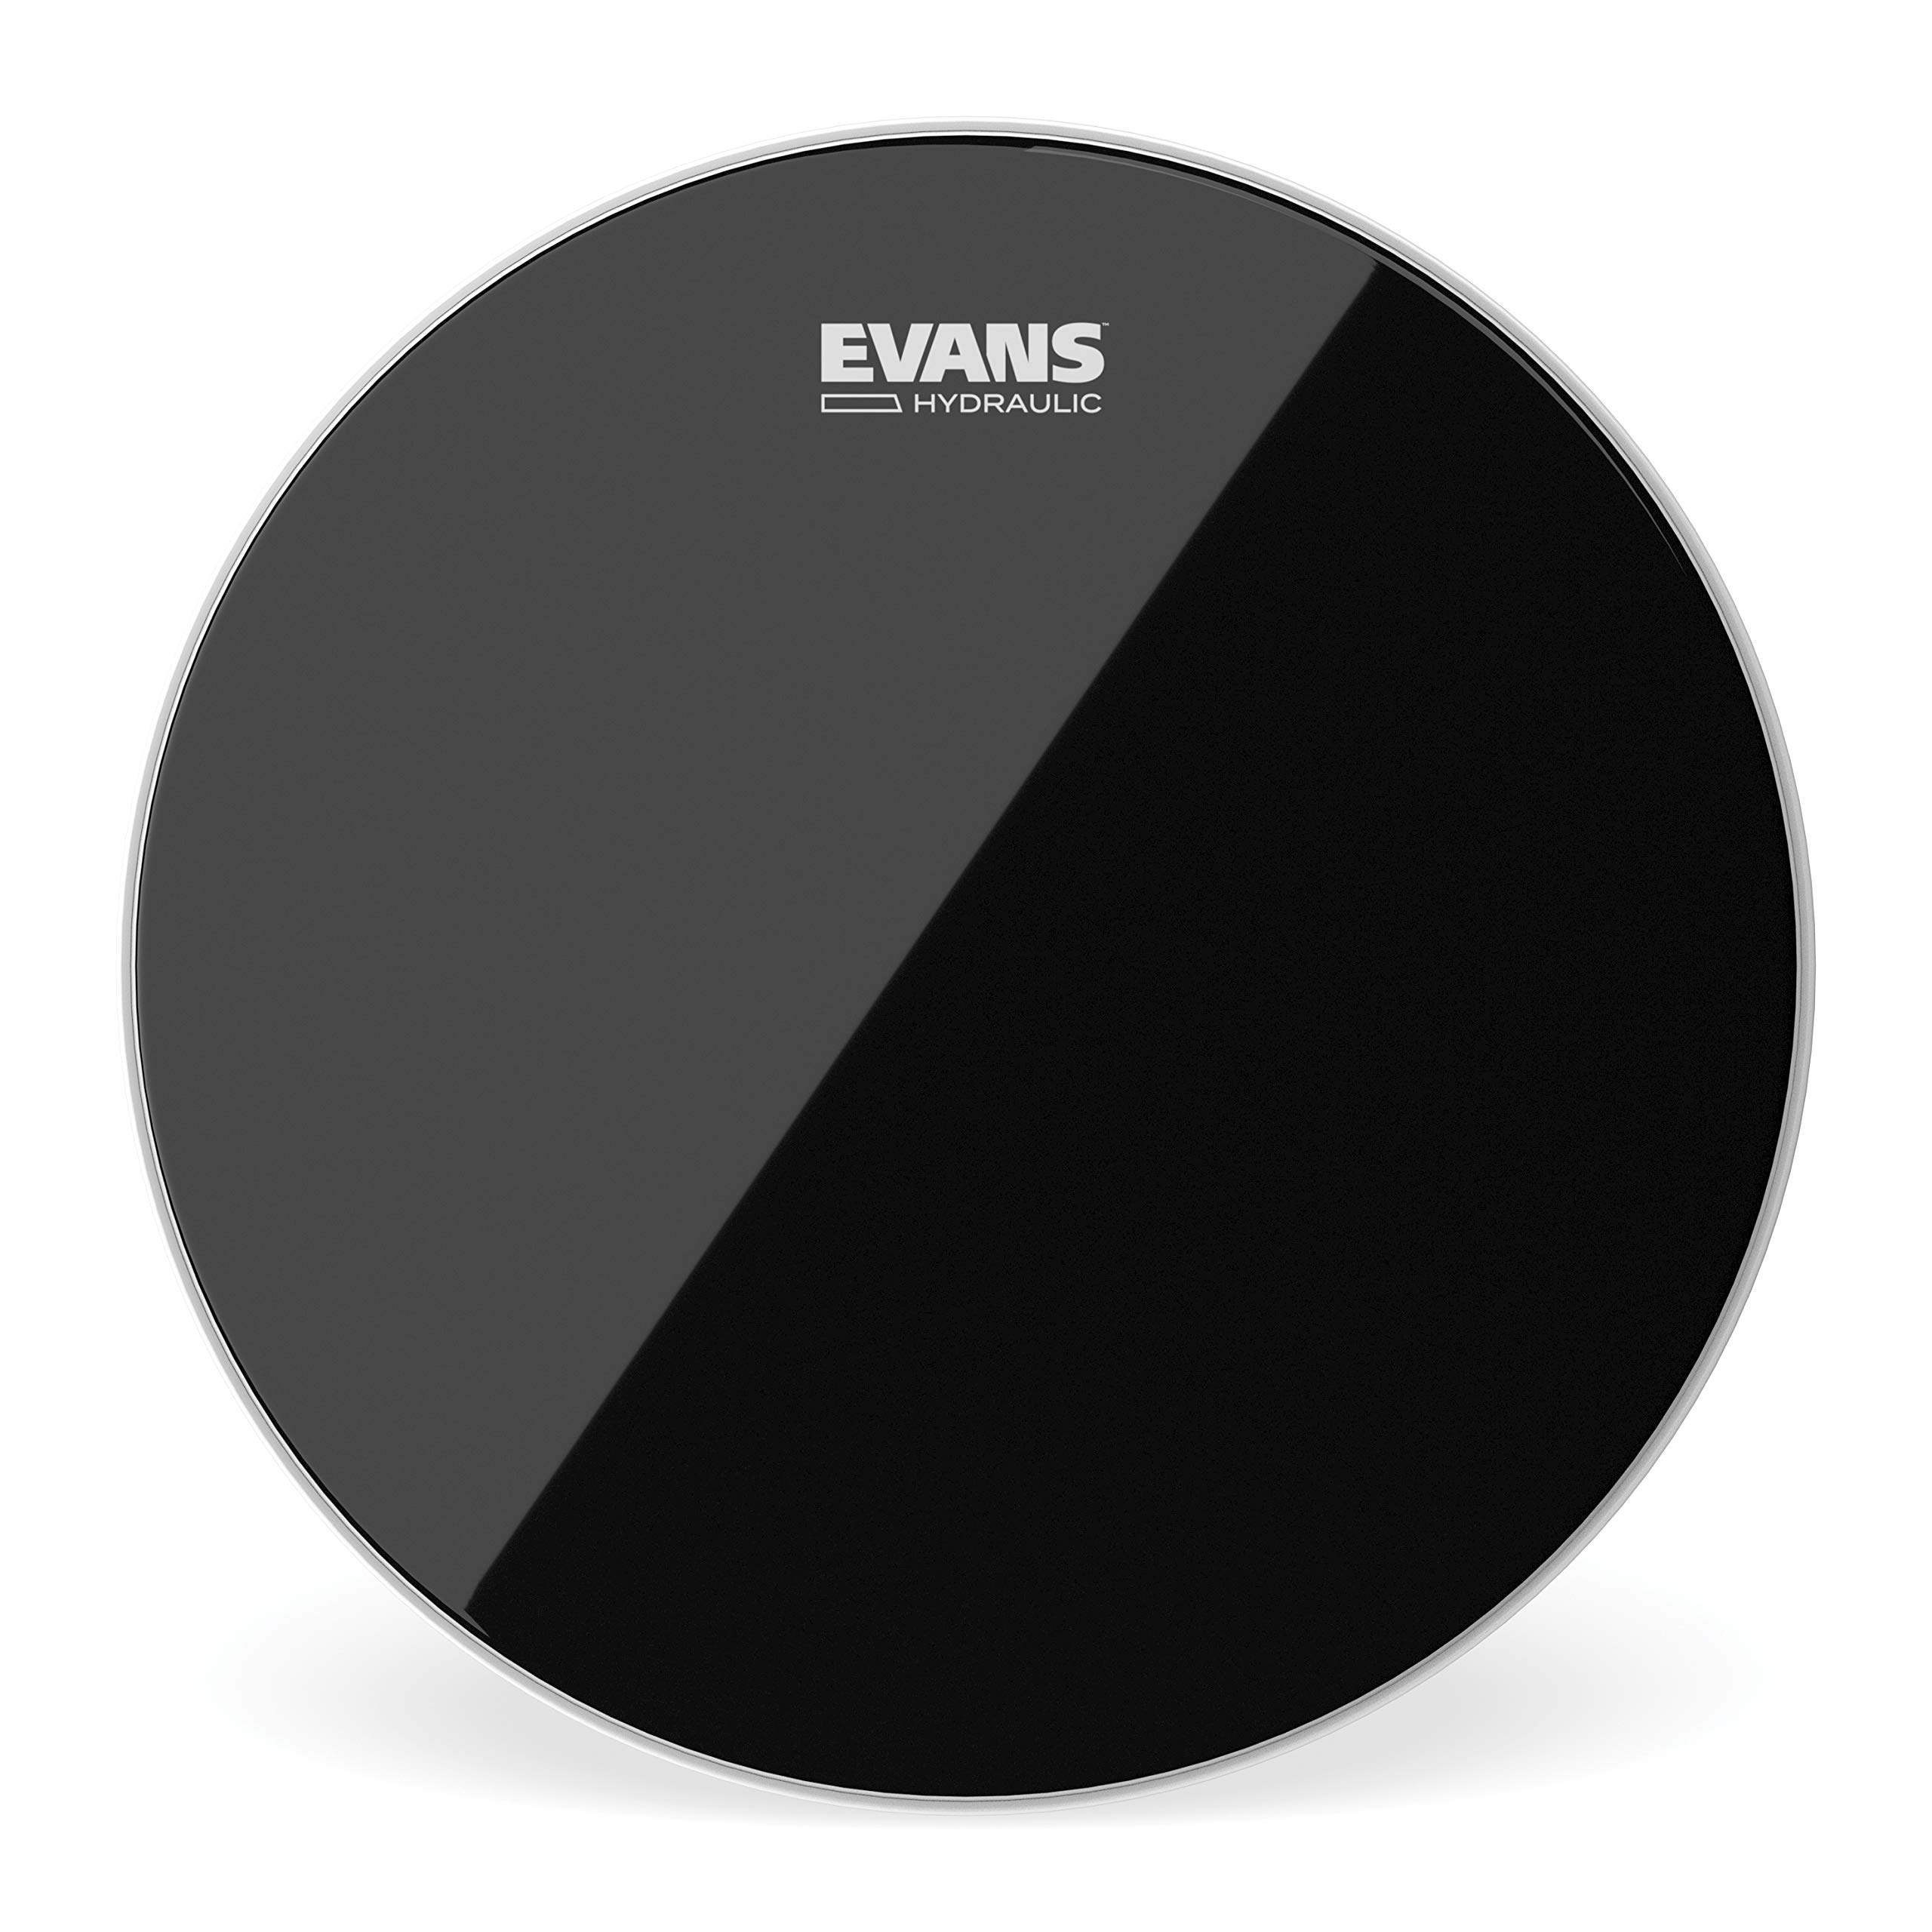 Evans Black Hydraulic Drum Head - 15 Inch